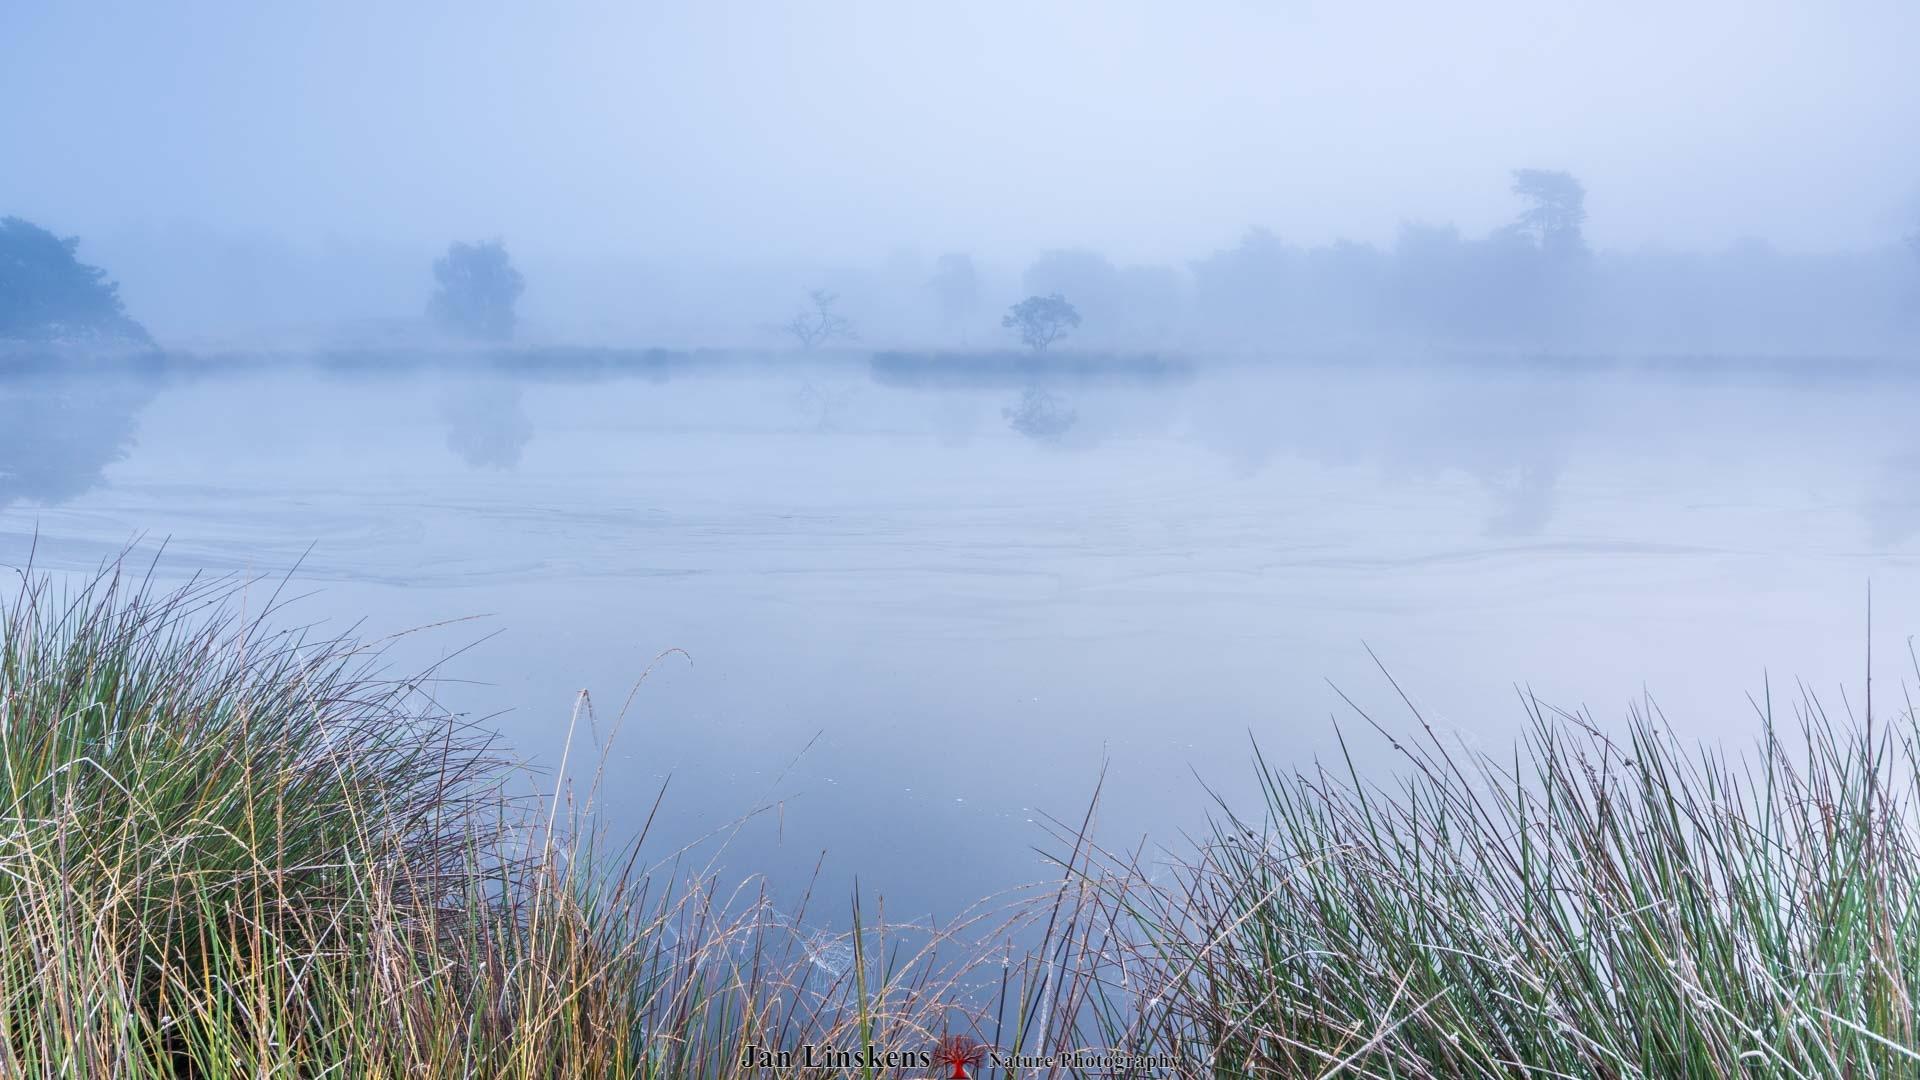 Fog by jan.linskens.18